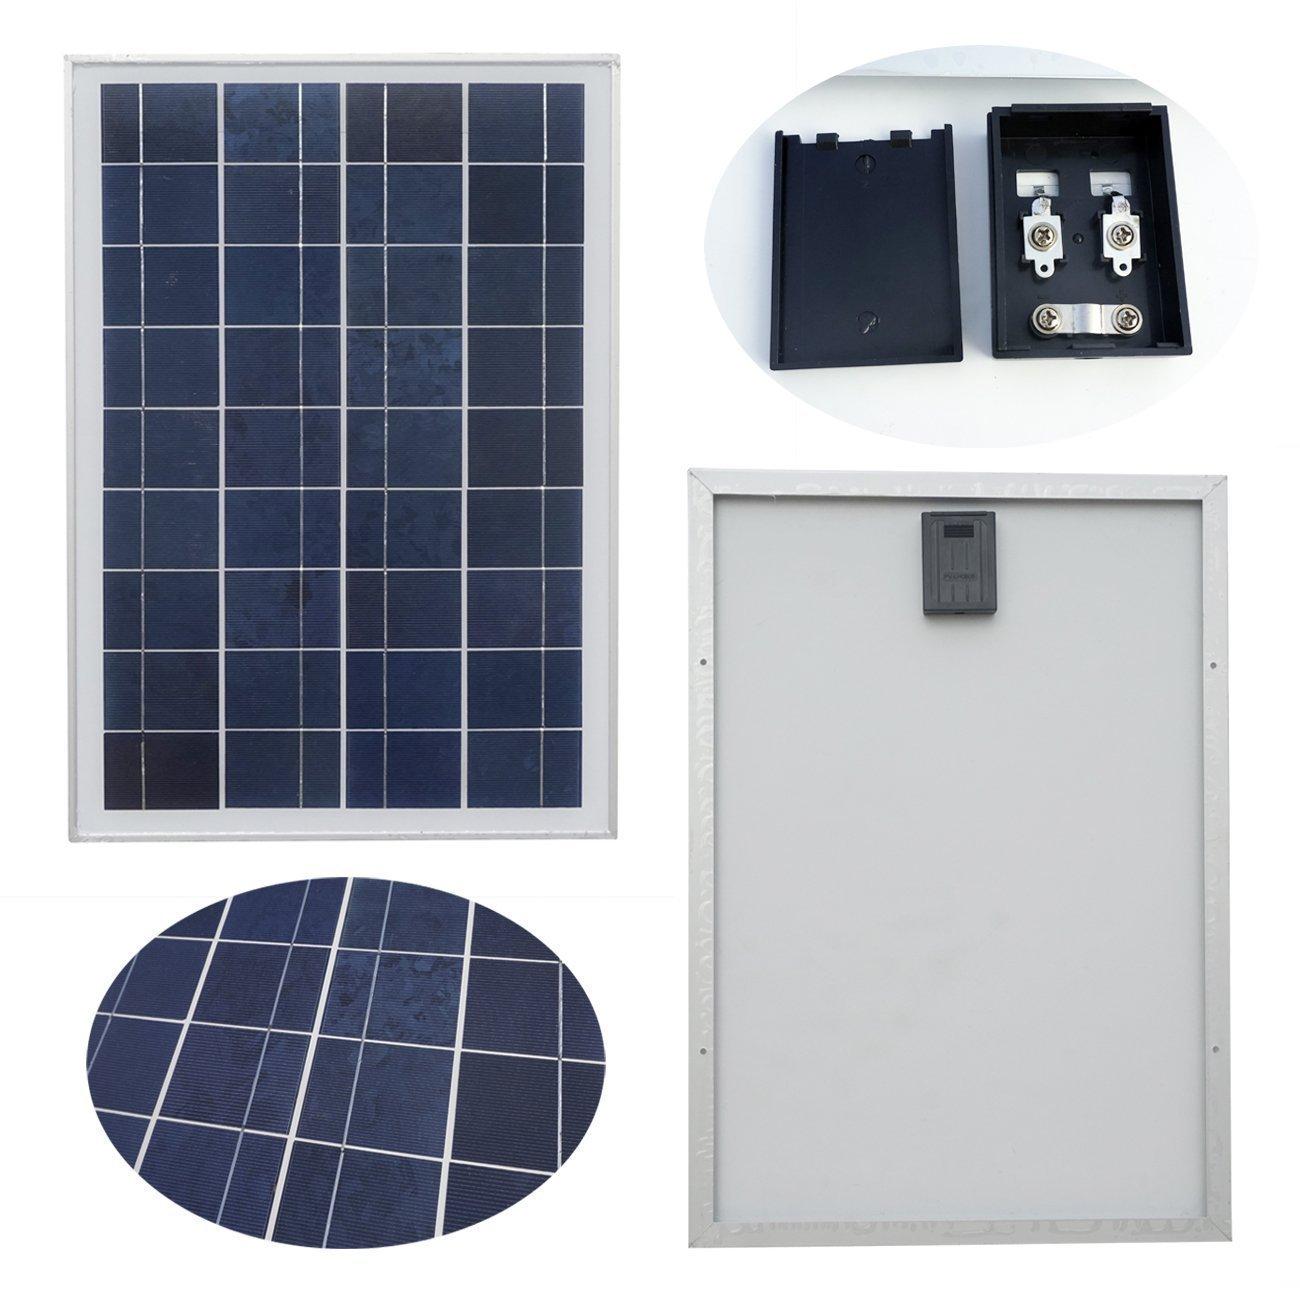 Great Amazon.com : ECO WORTHY 20 Watt 12 Volt Polycrystalline Solar Panel Module  Off Grid Charging RV Boat : Garden U0026 Outdoor